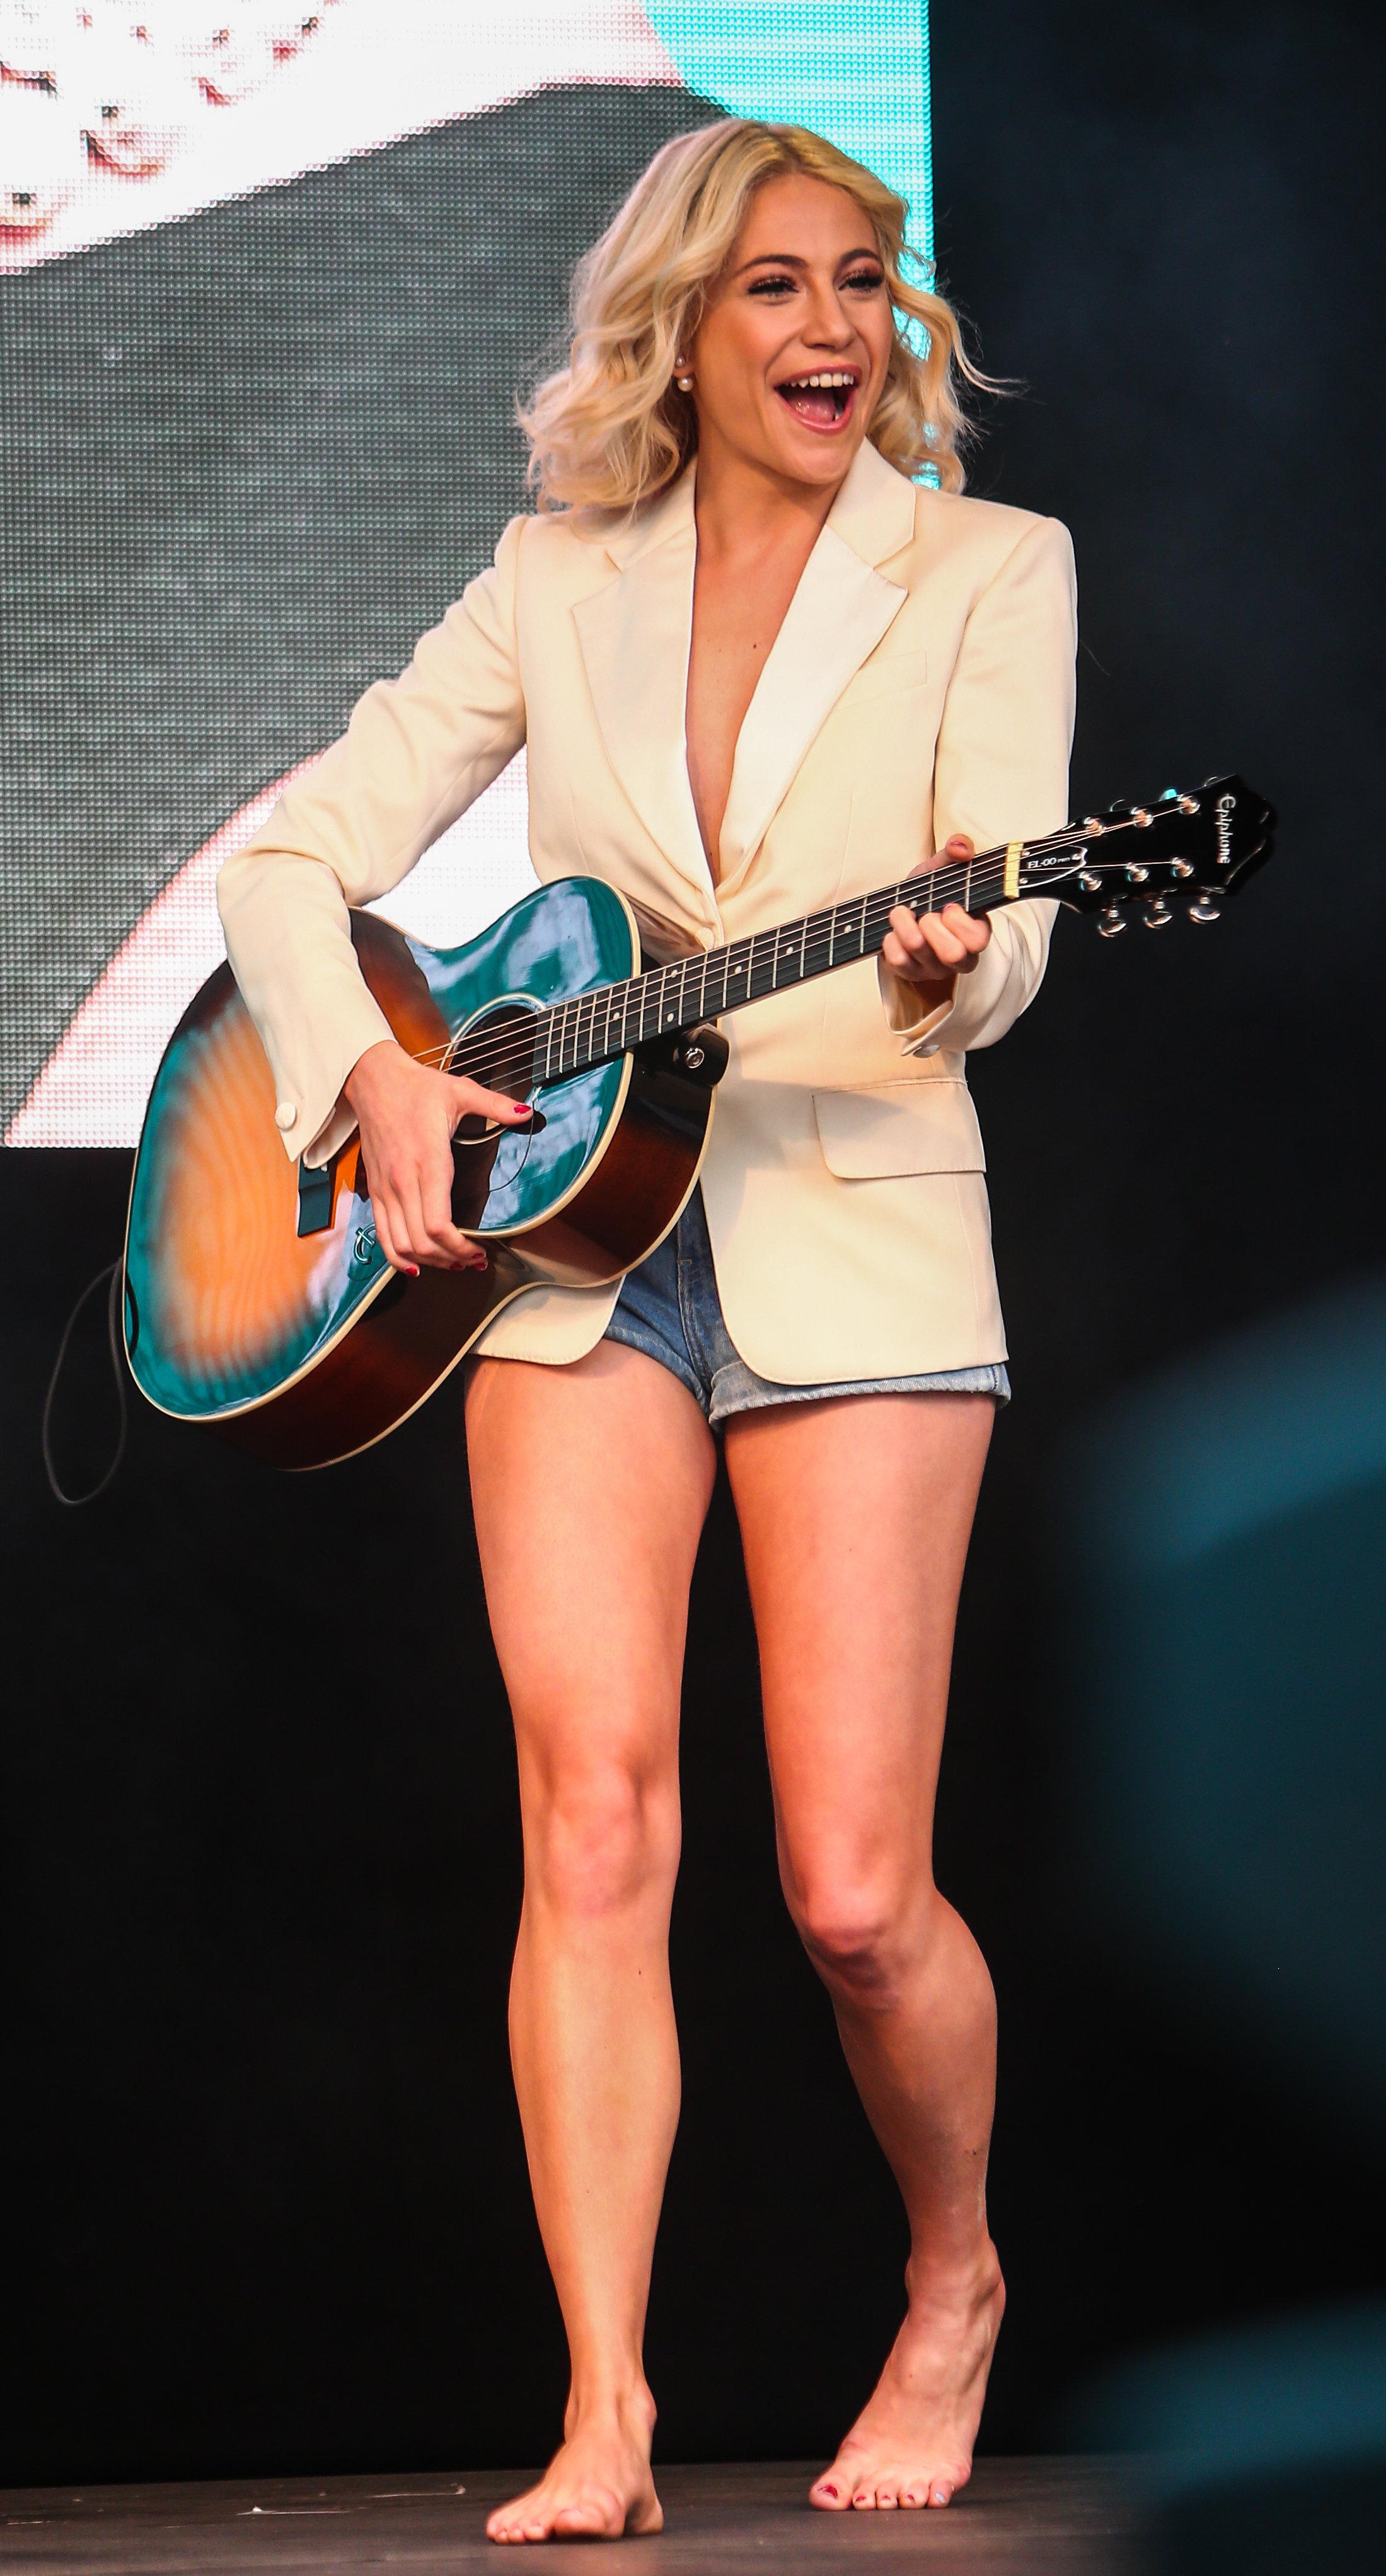 Feet Pixie Lott nude (46 photo), Sexy, Leaked, Feet, in bikini 2020